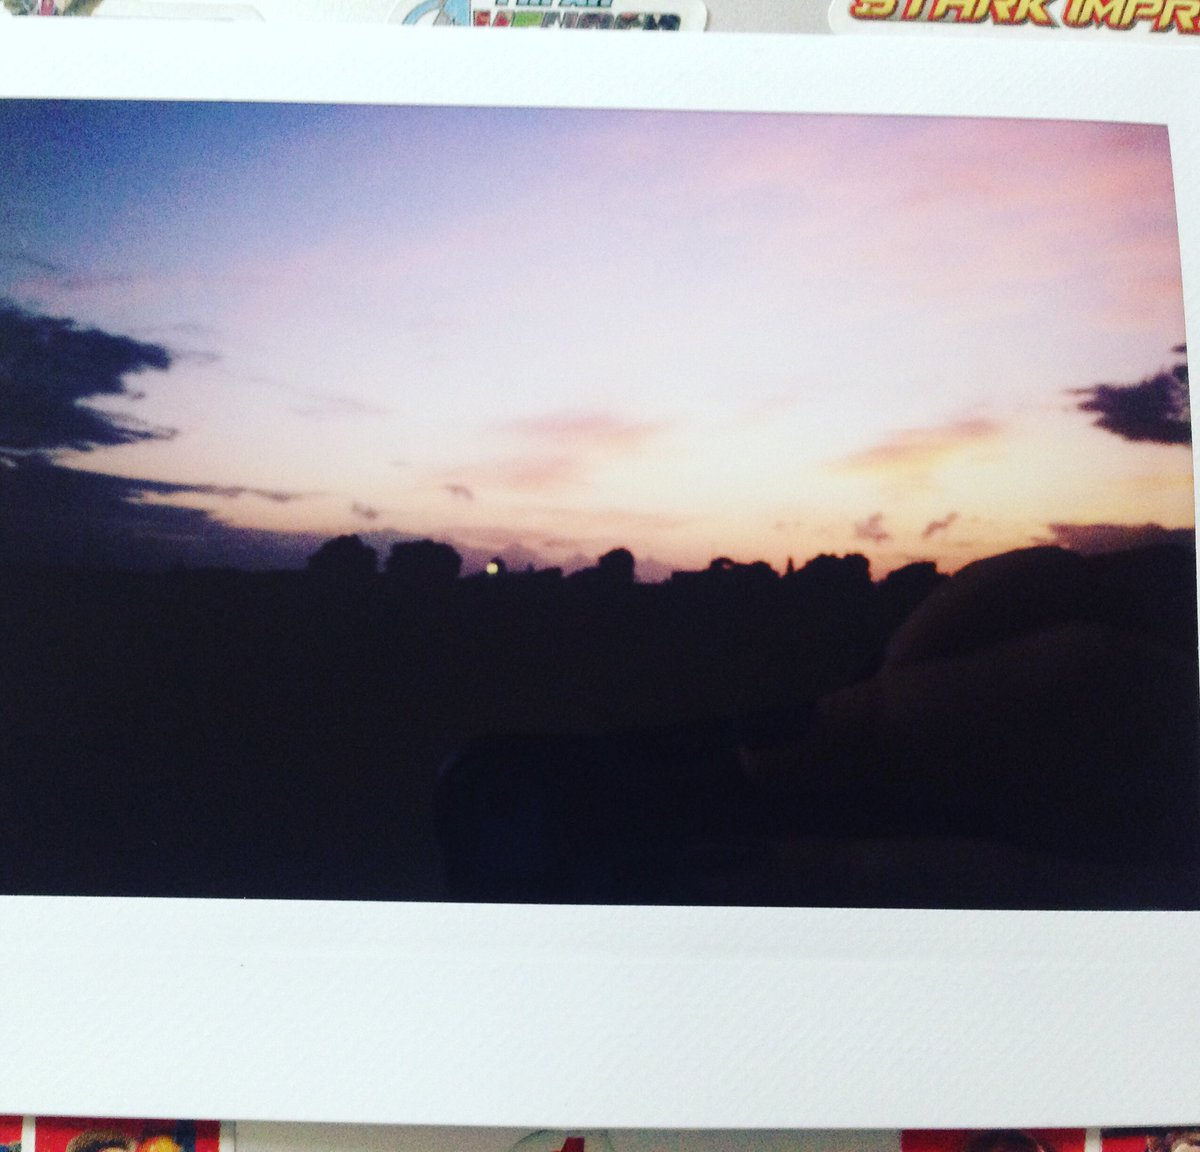 Hannah Plane's image